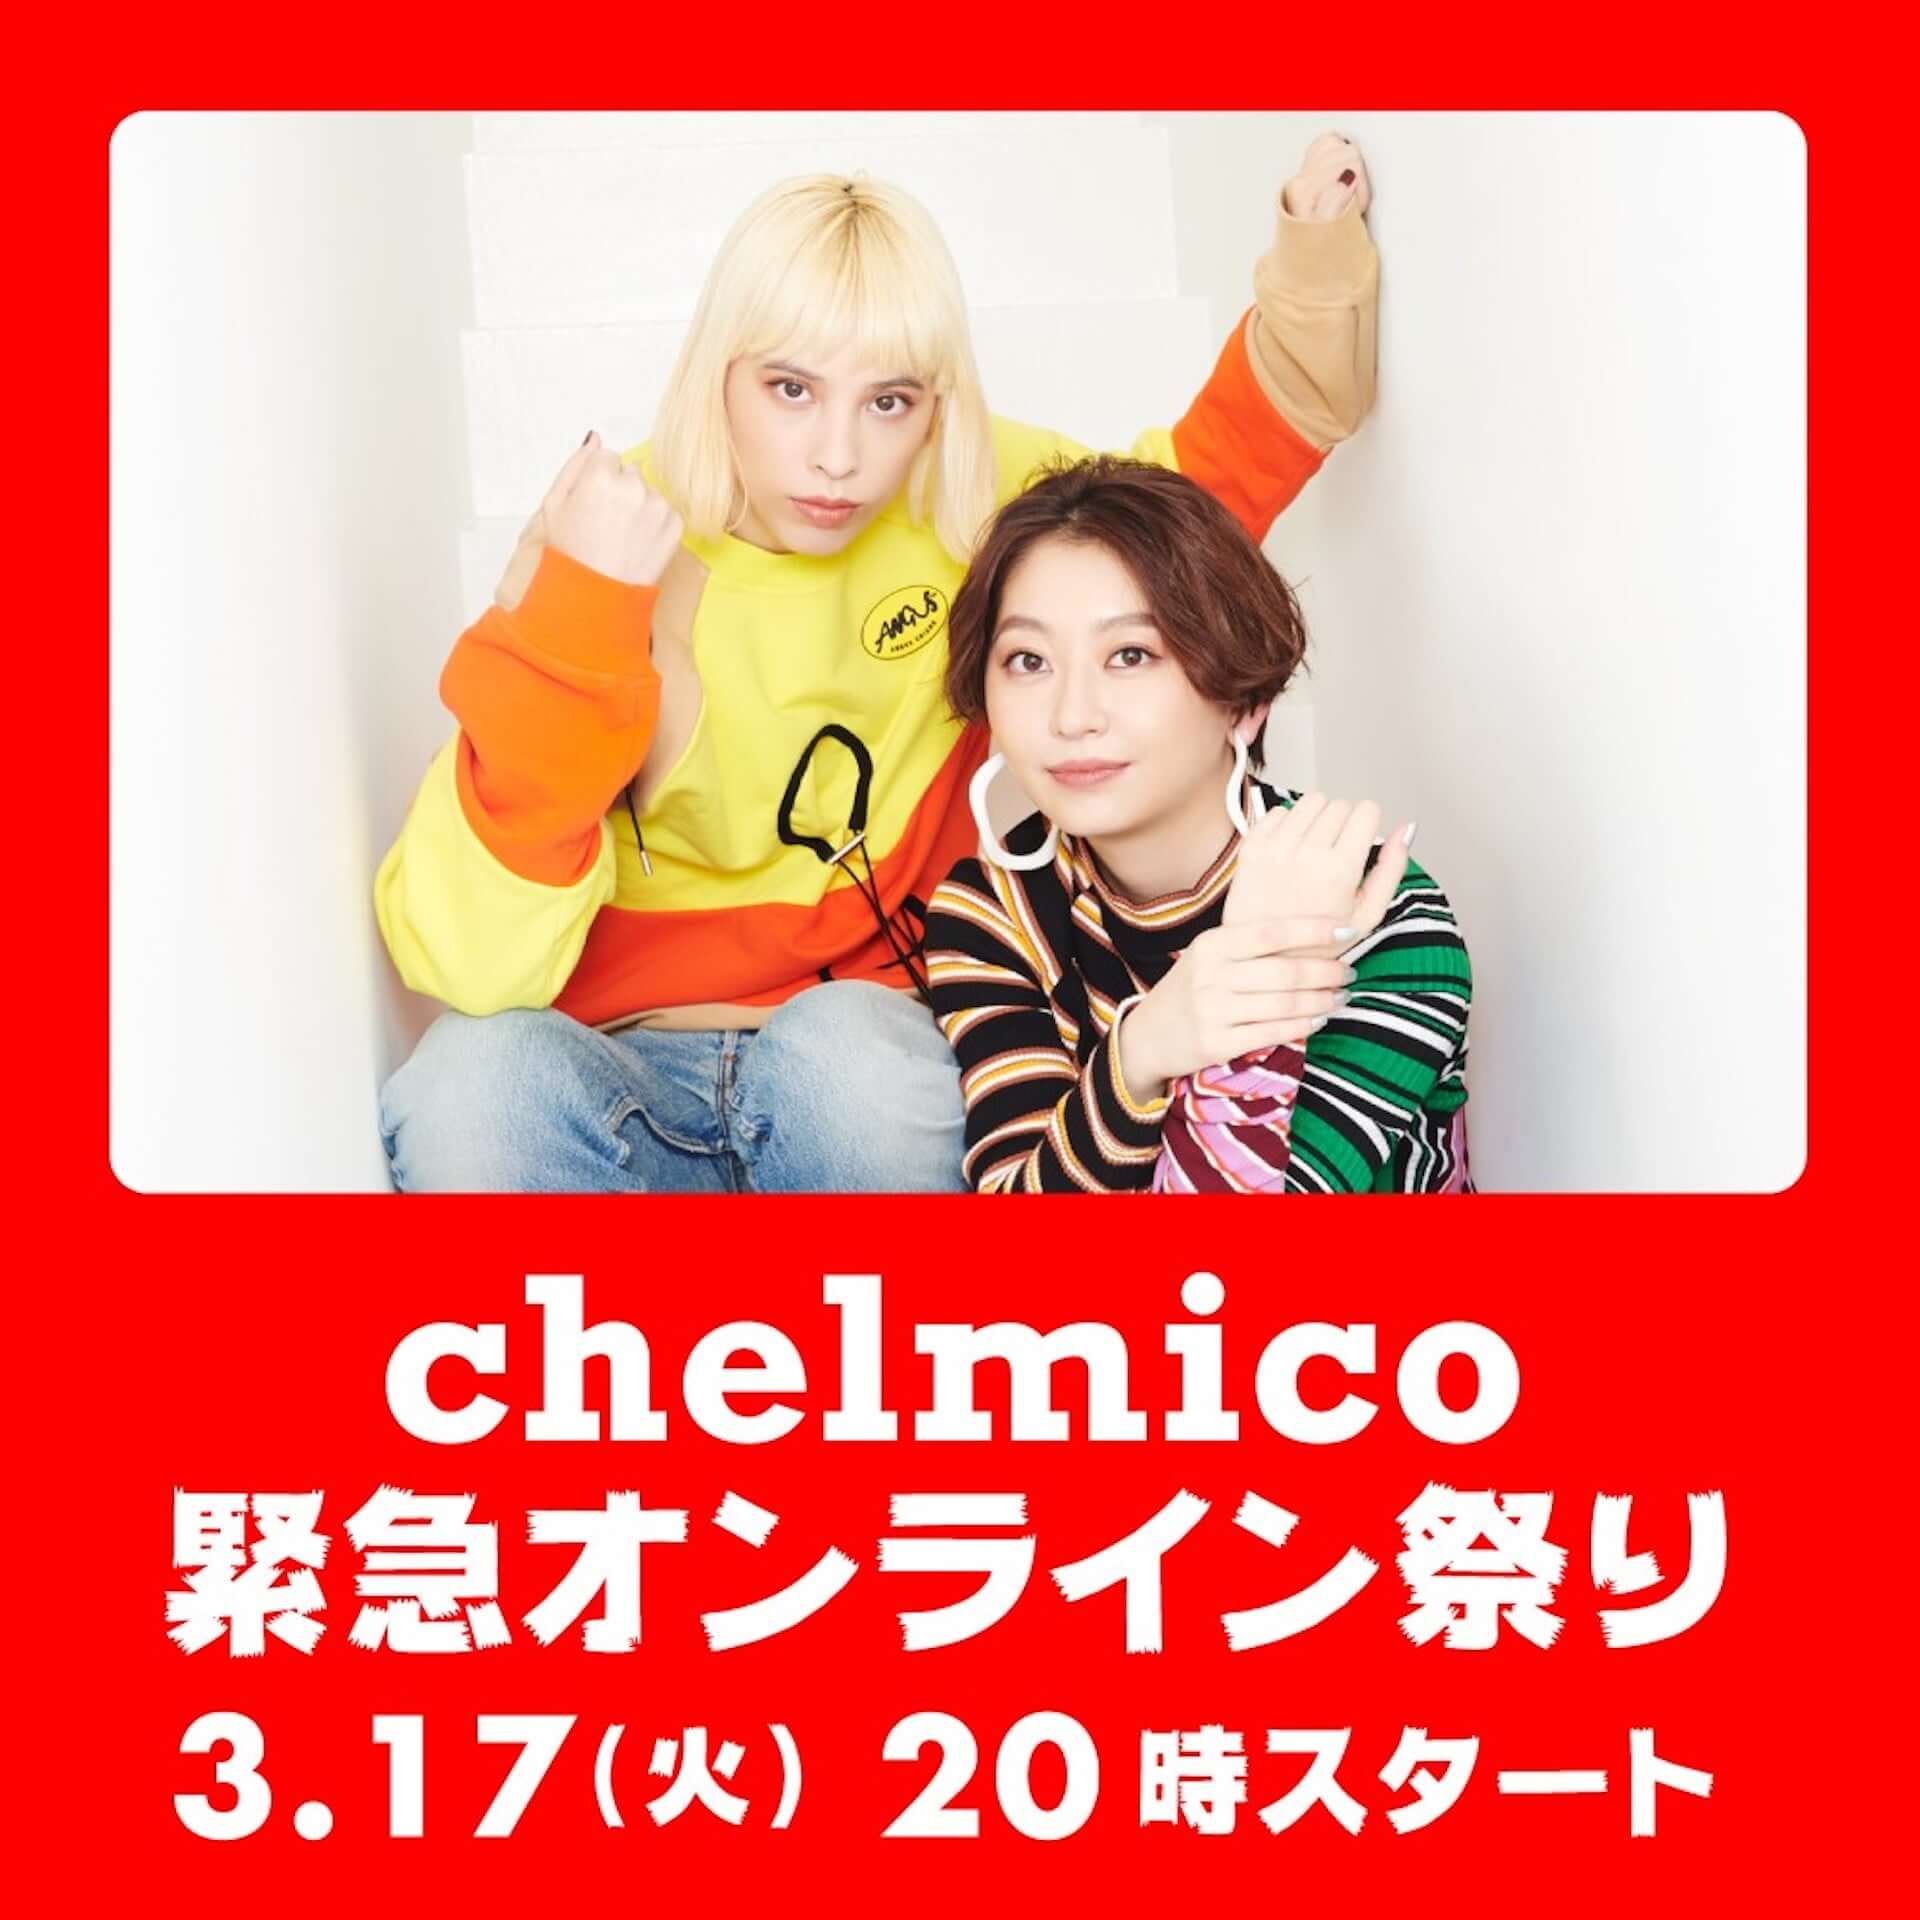 chelmicoの新シングル「Terminal 着、即 Dance」がリリース決定!明日生配信番組も急遽実施 music200316_chelmico_1-1920x1920